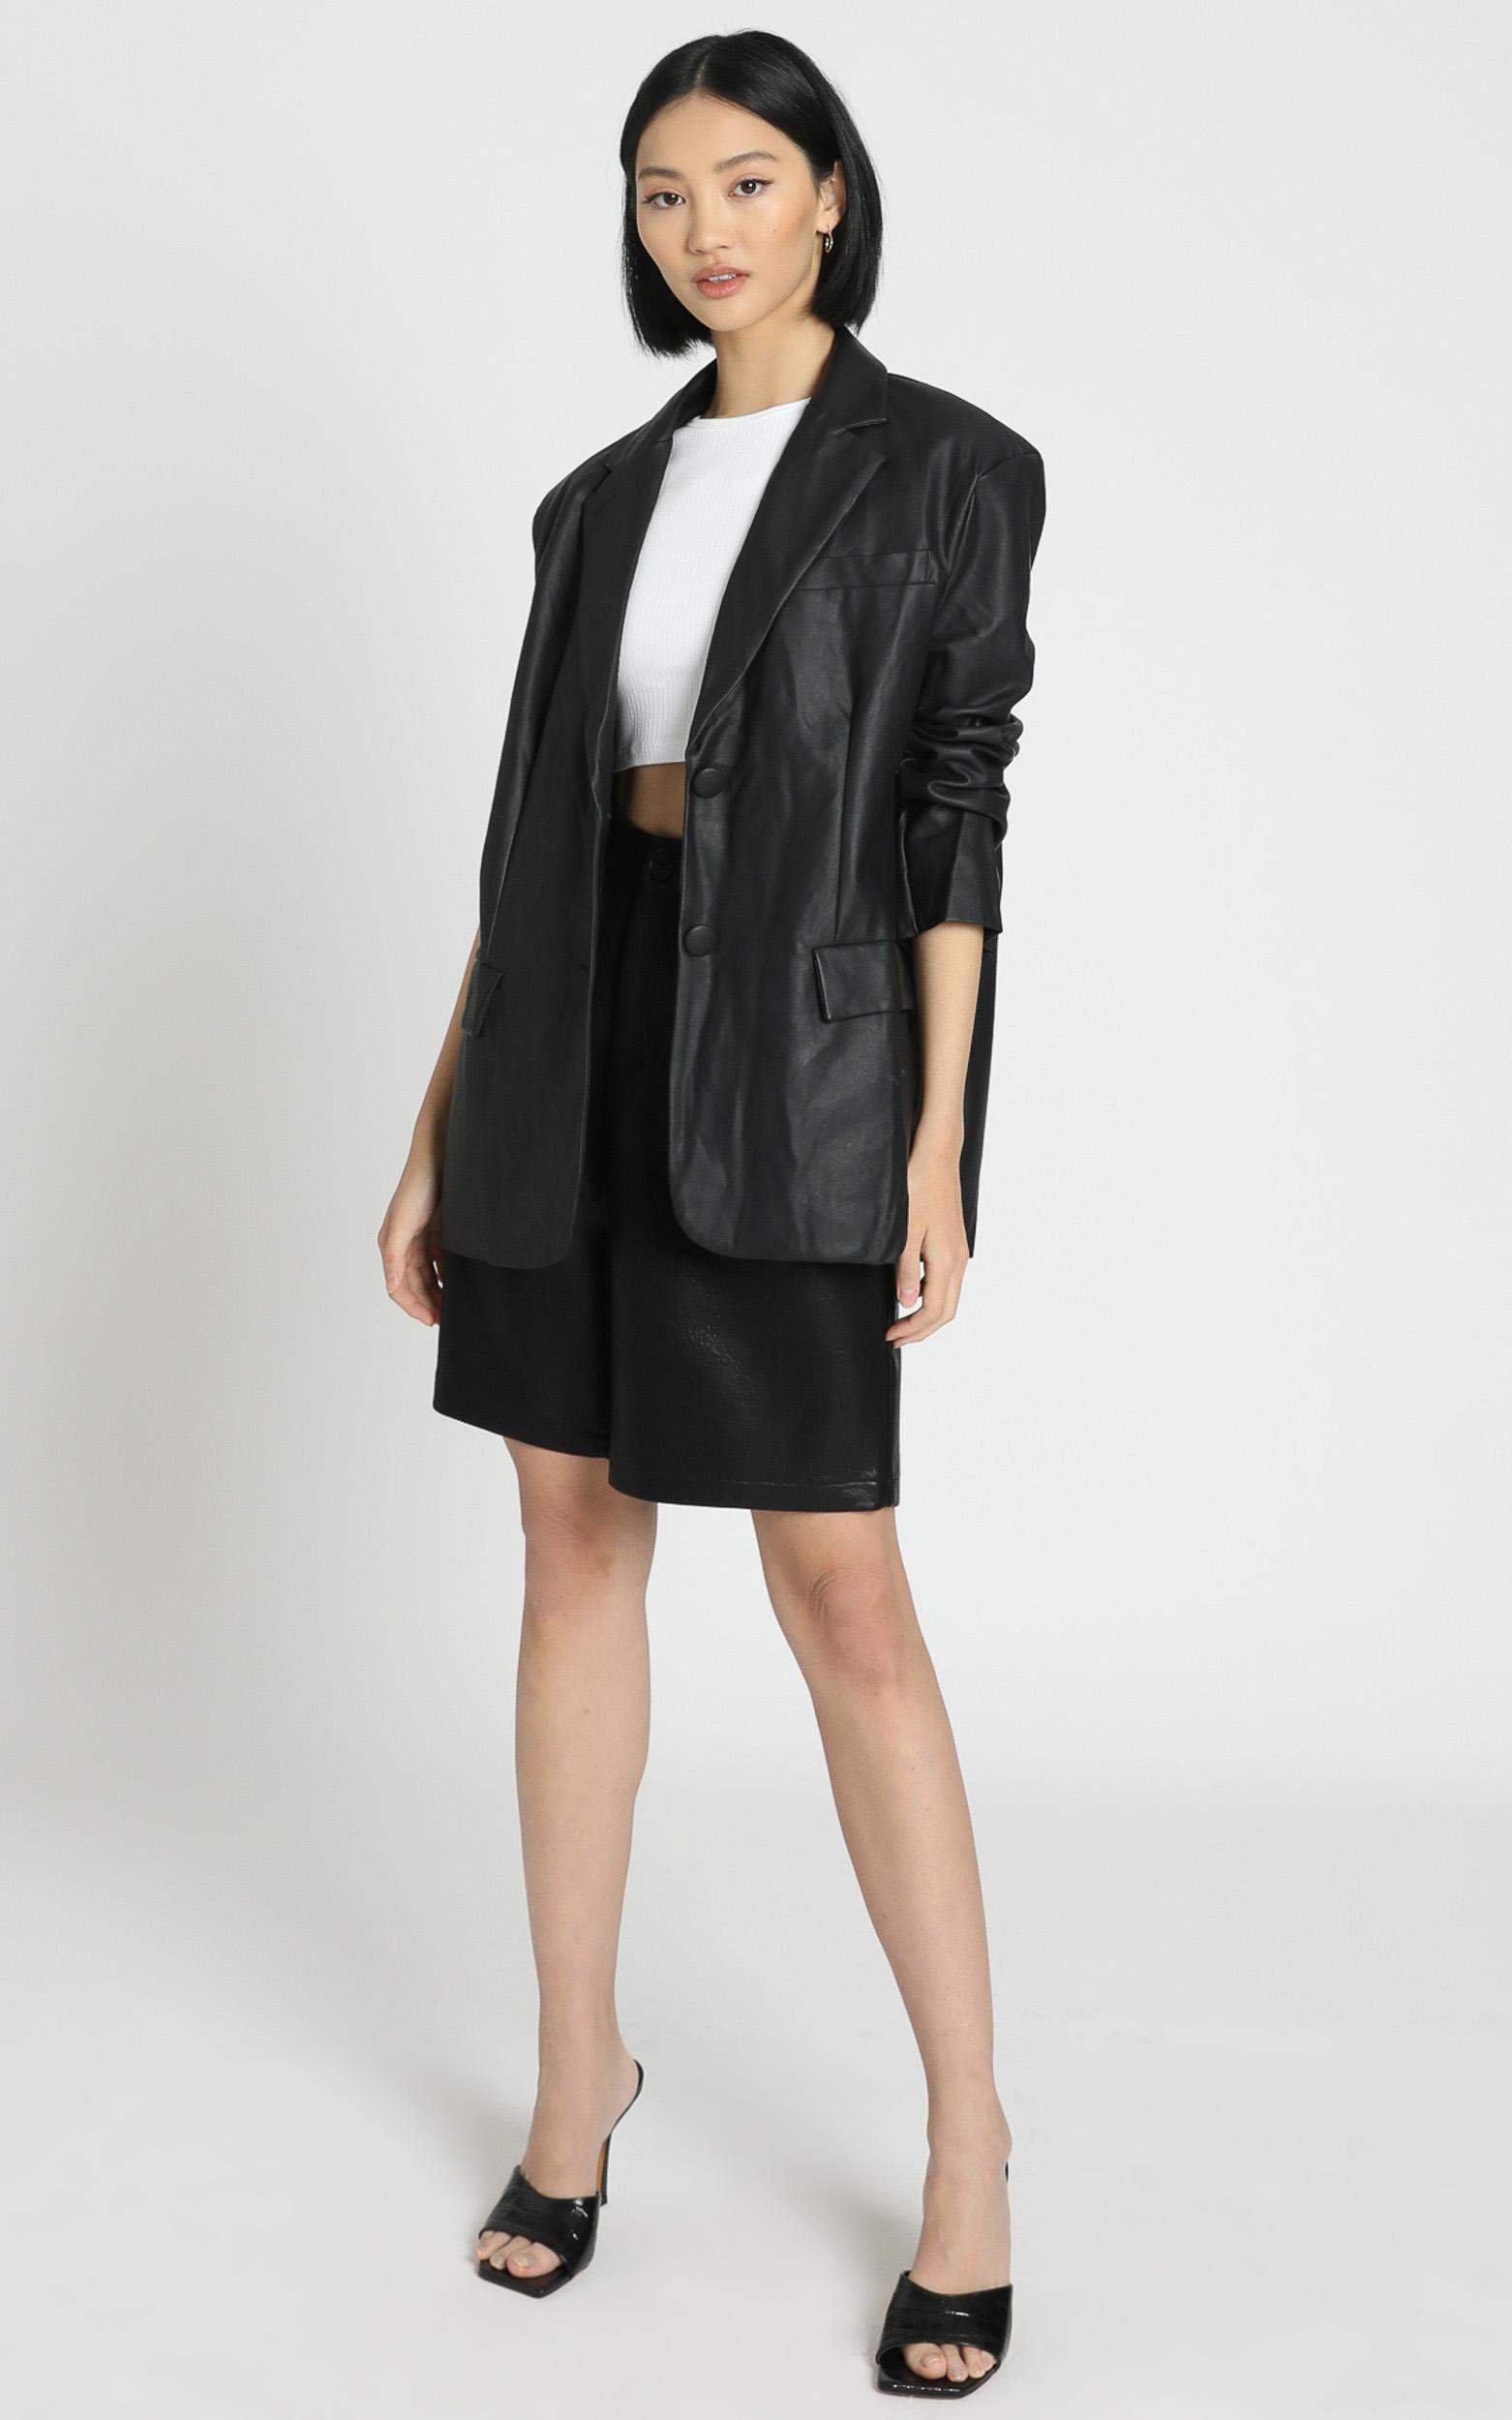 Tasya Blazer in Black - S/M, Black, hi-res image number null